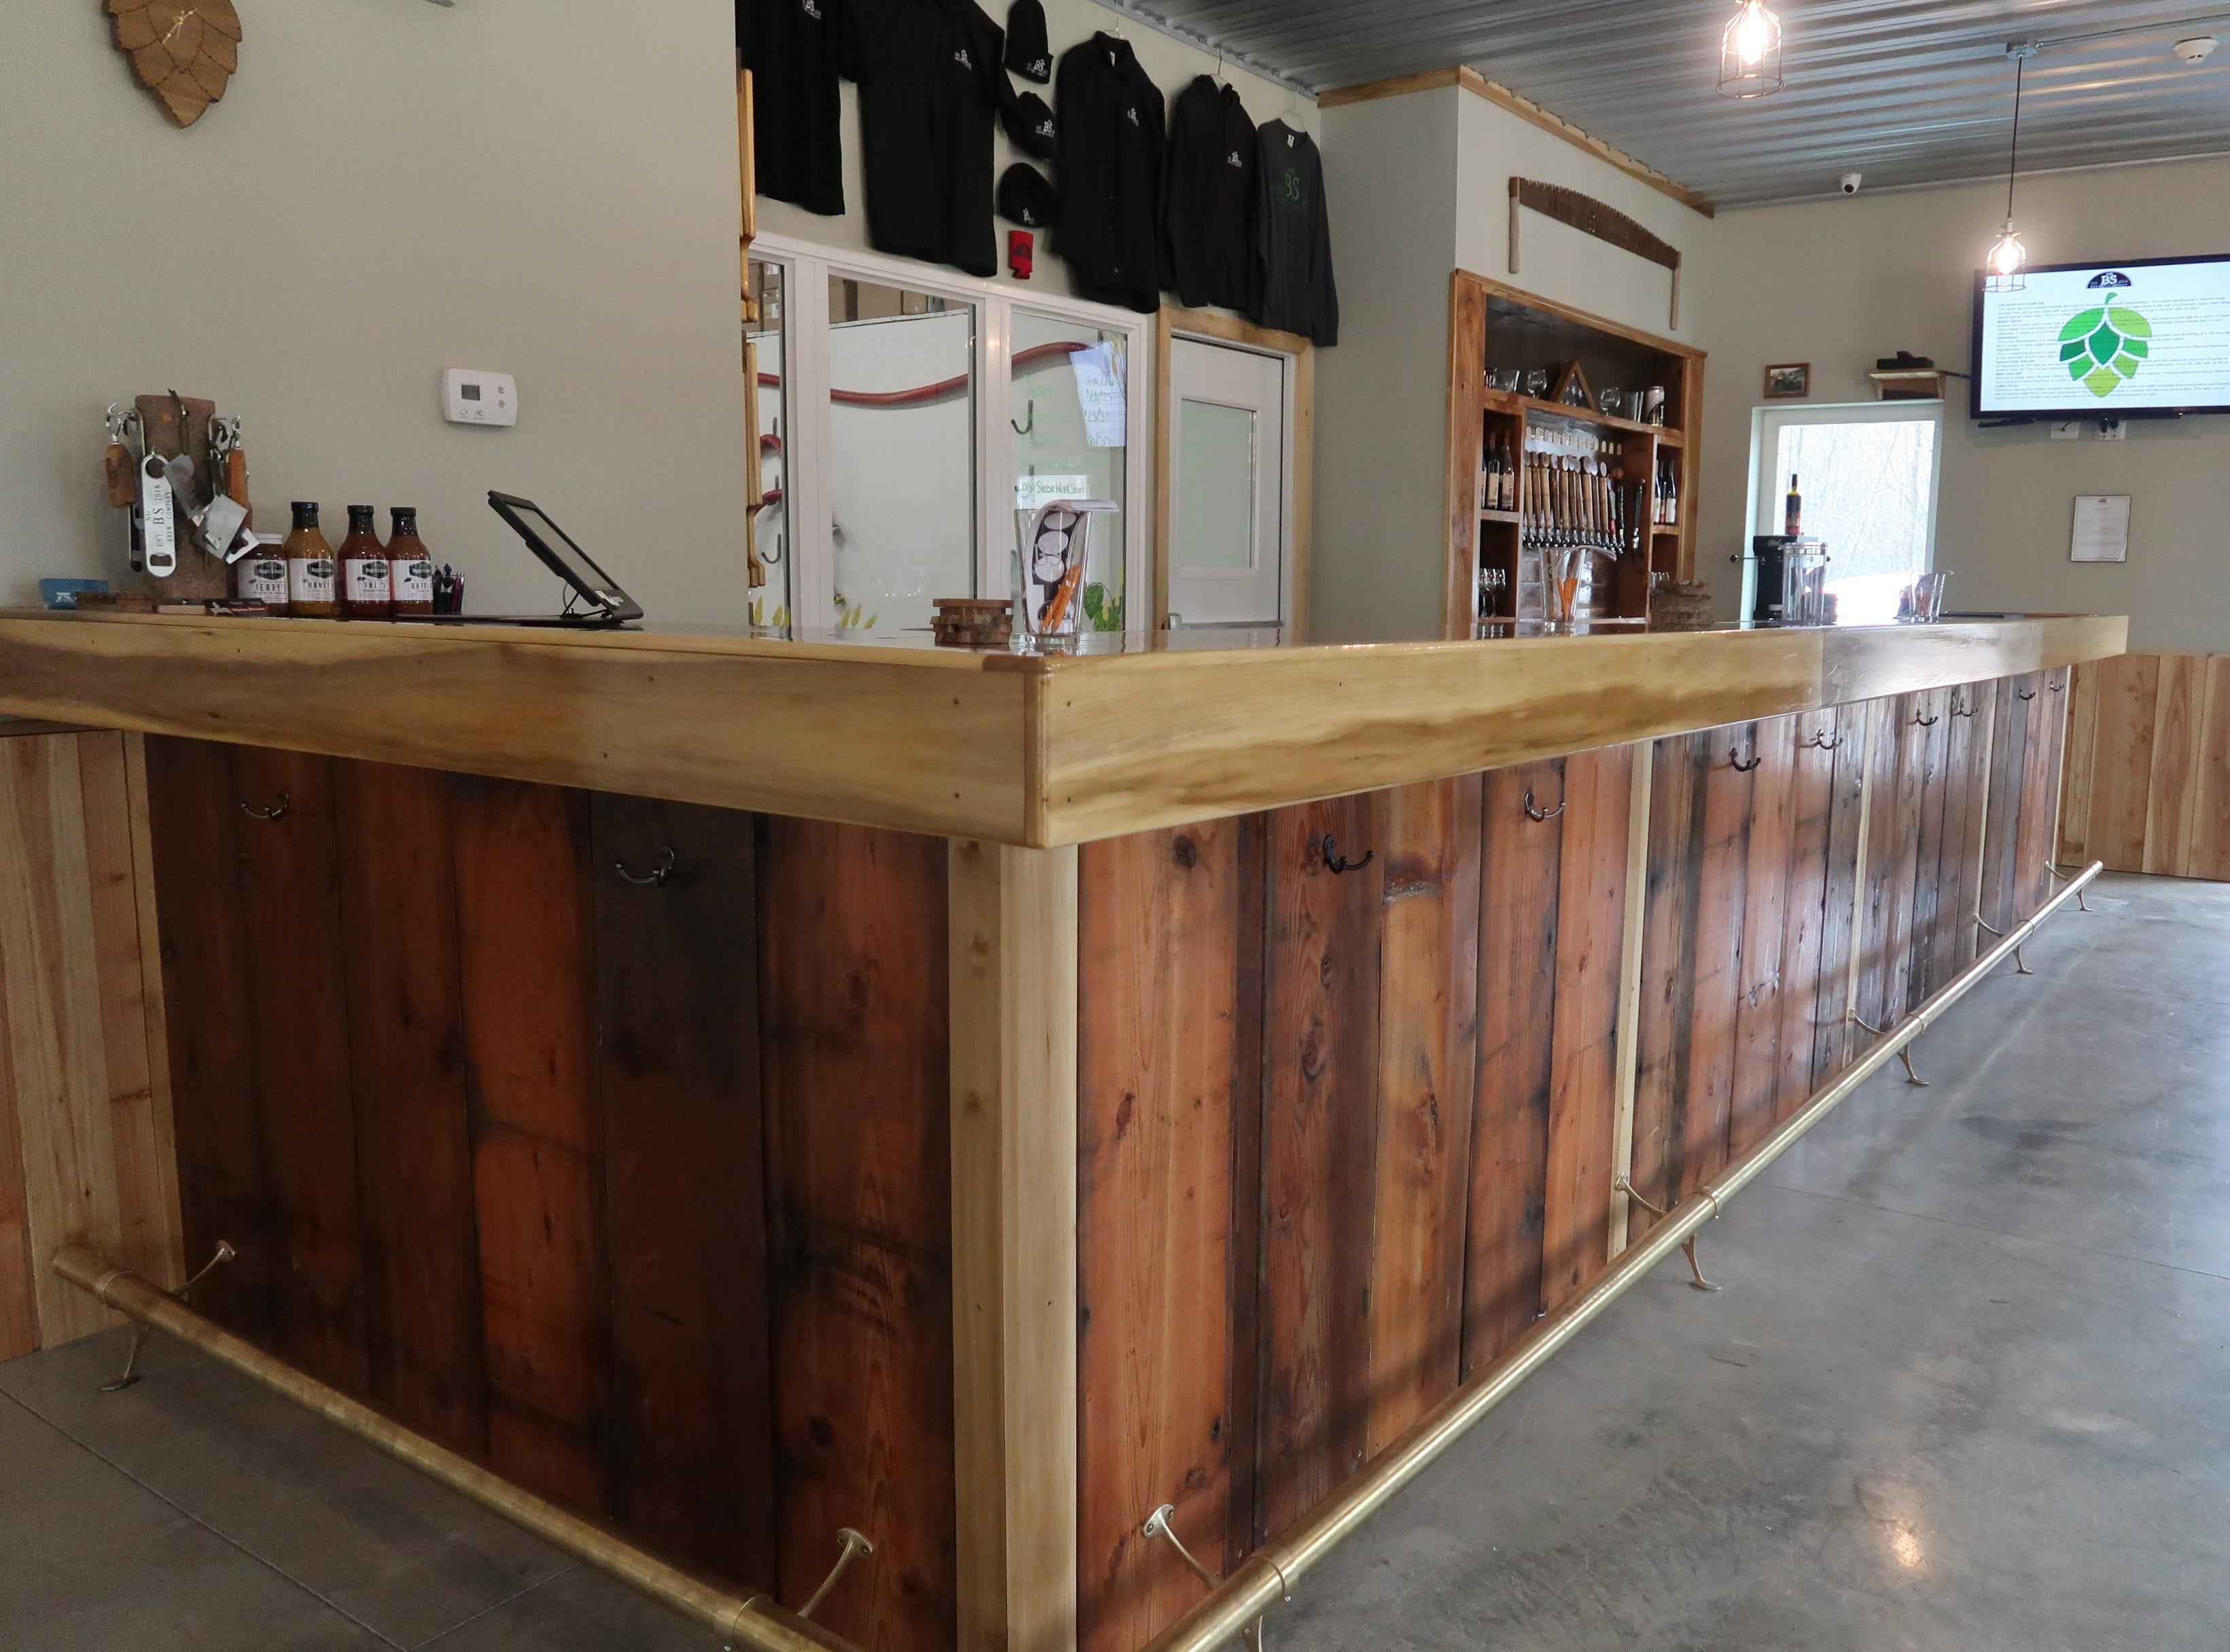 No BS Brew Company in Livonia.